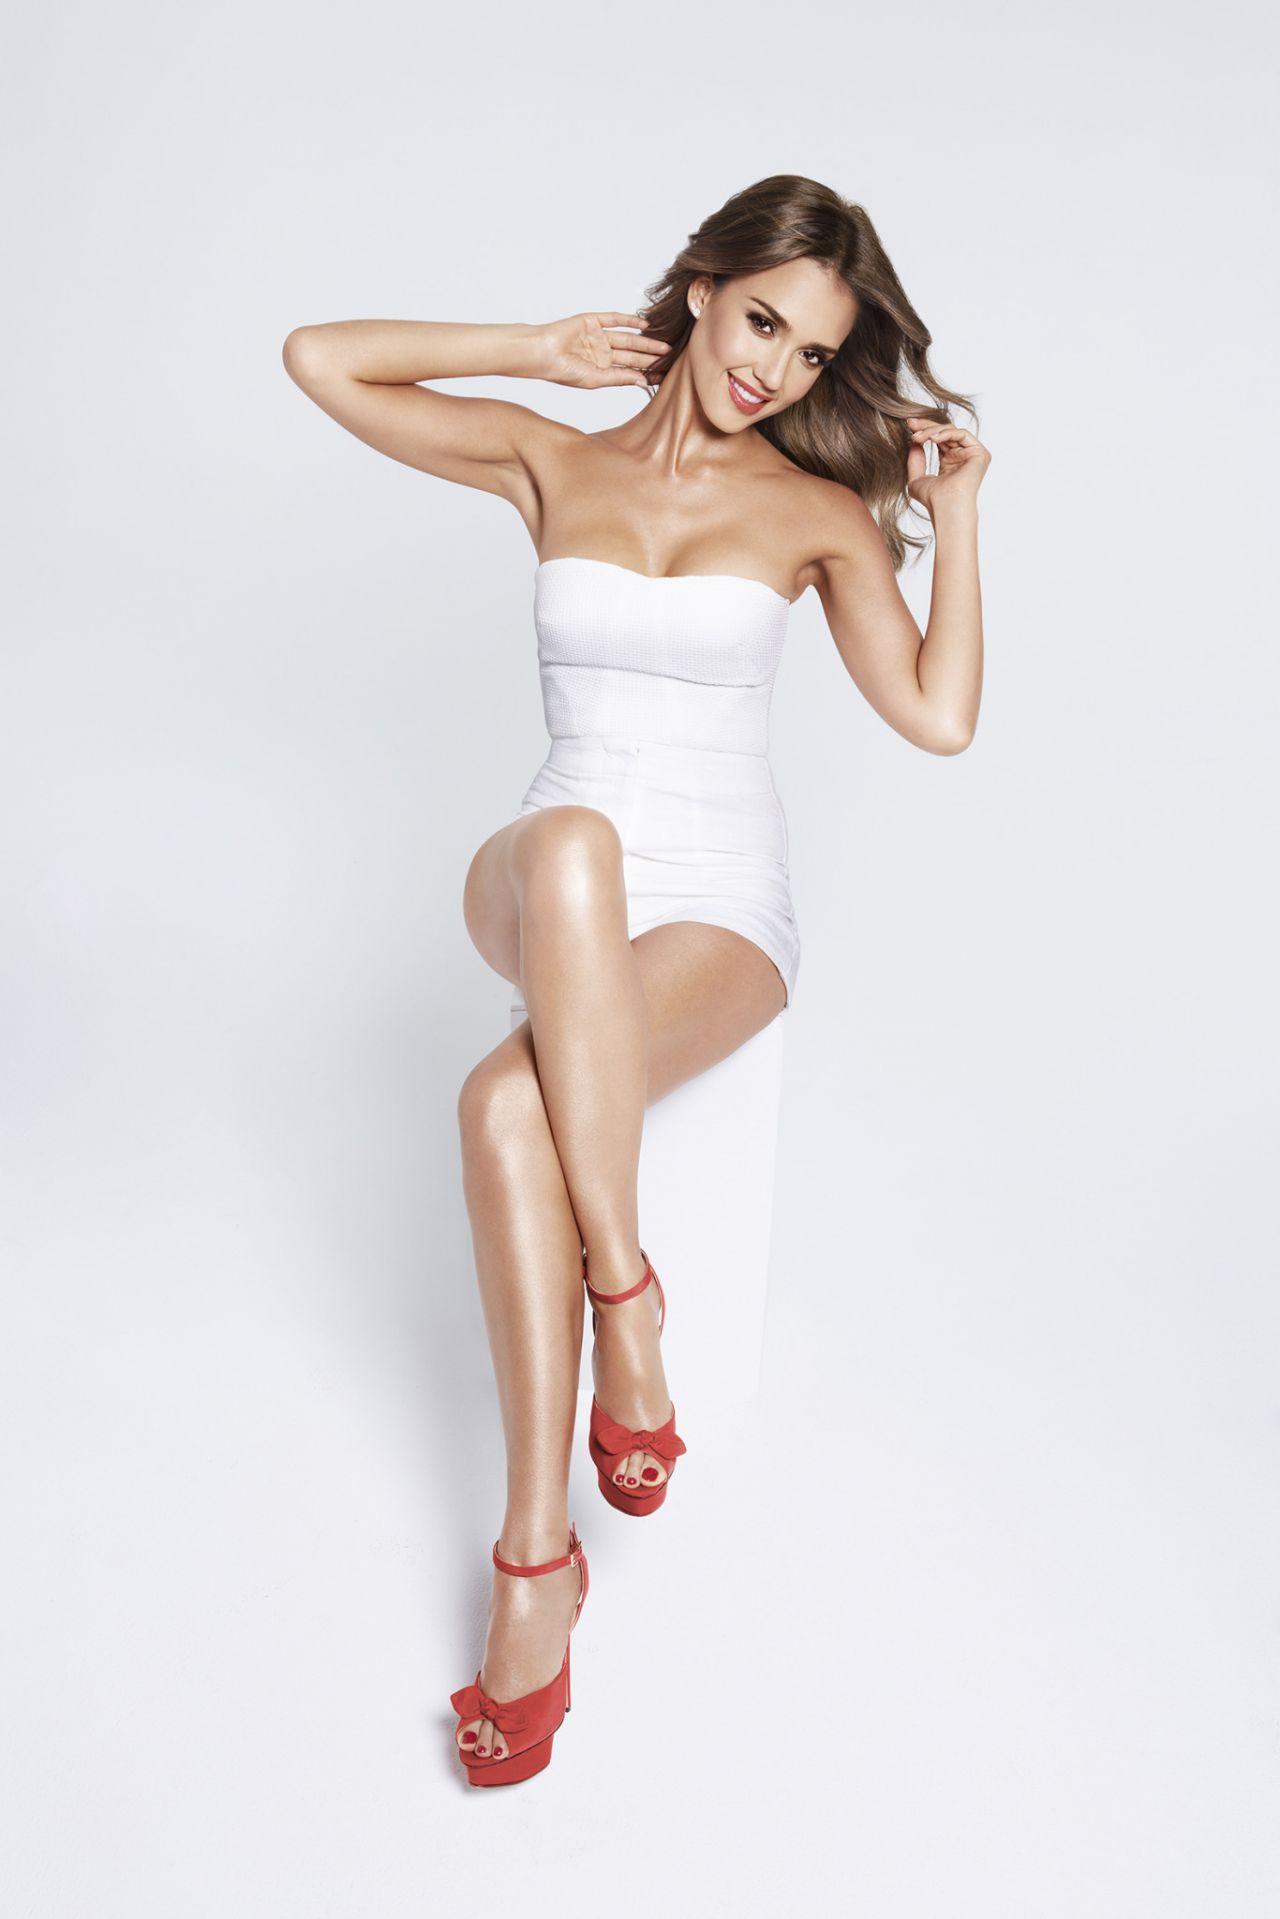 Jessica Alba Nude Pics & Videos That